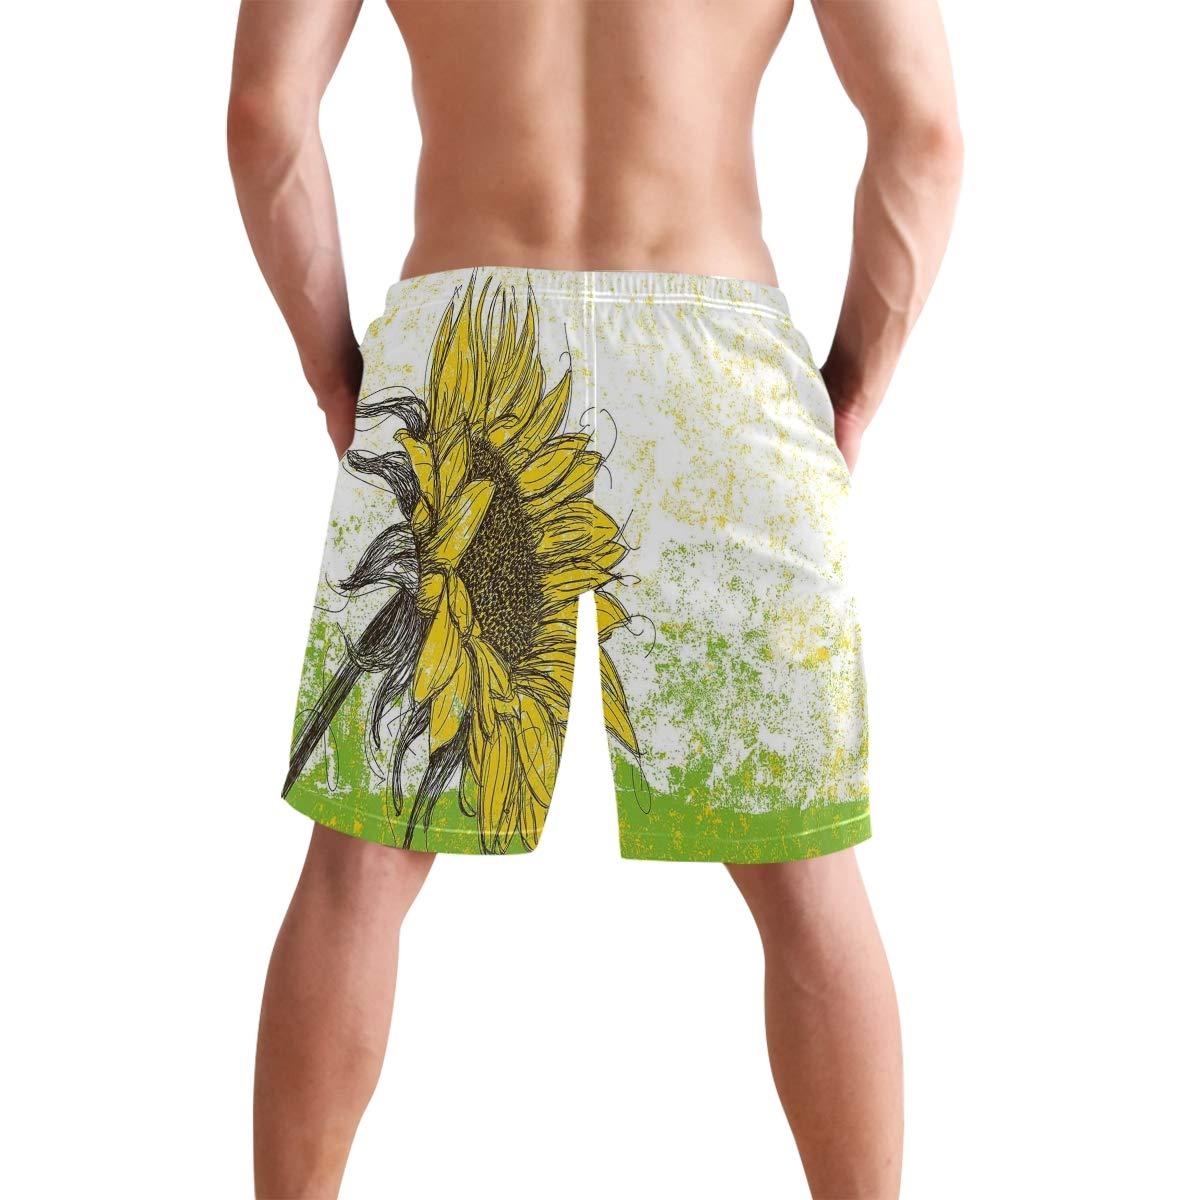 COVASA Mens Summer ShortsFloral Print with Sunflowers Field Summer Garden Sket